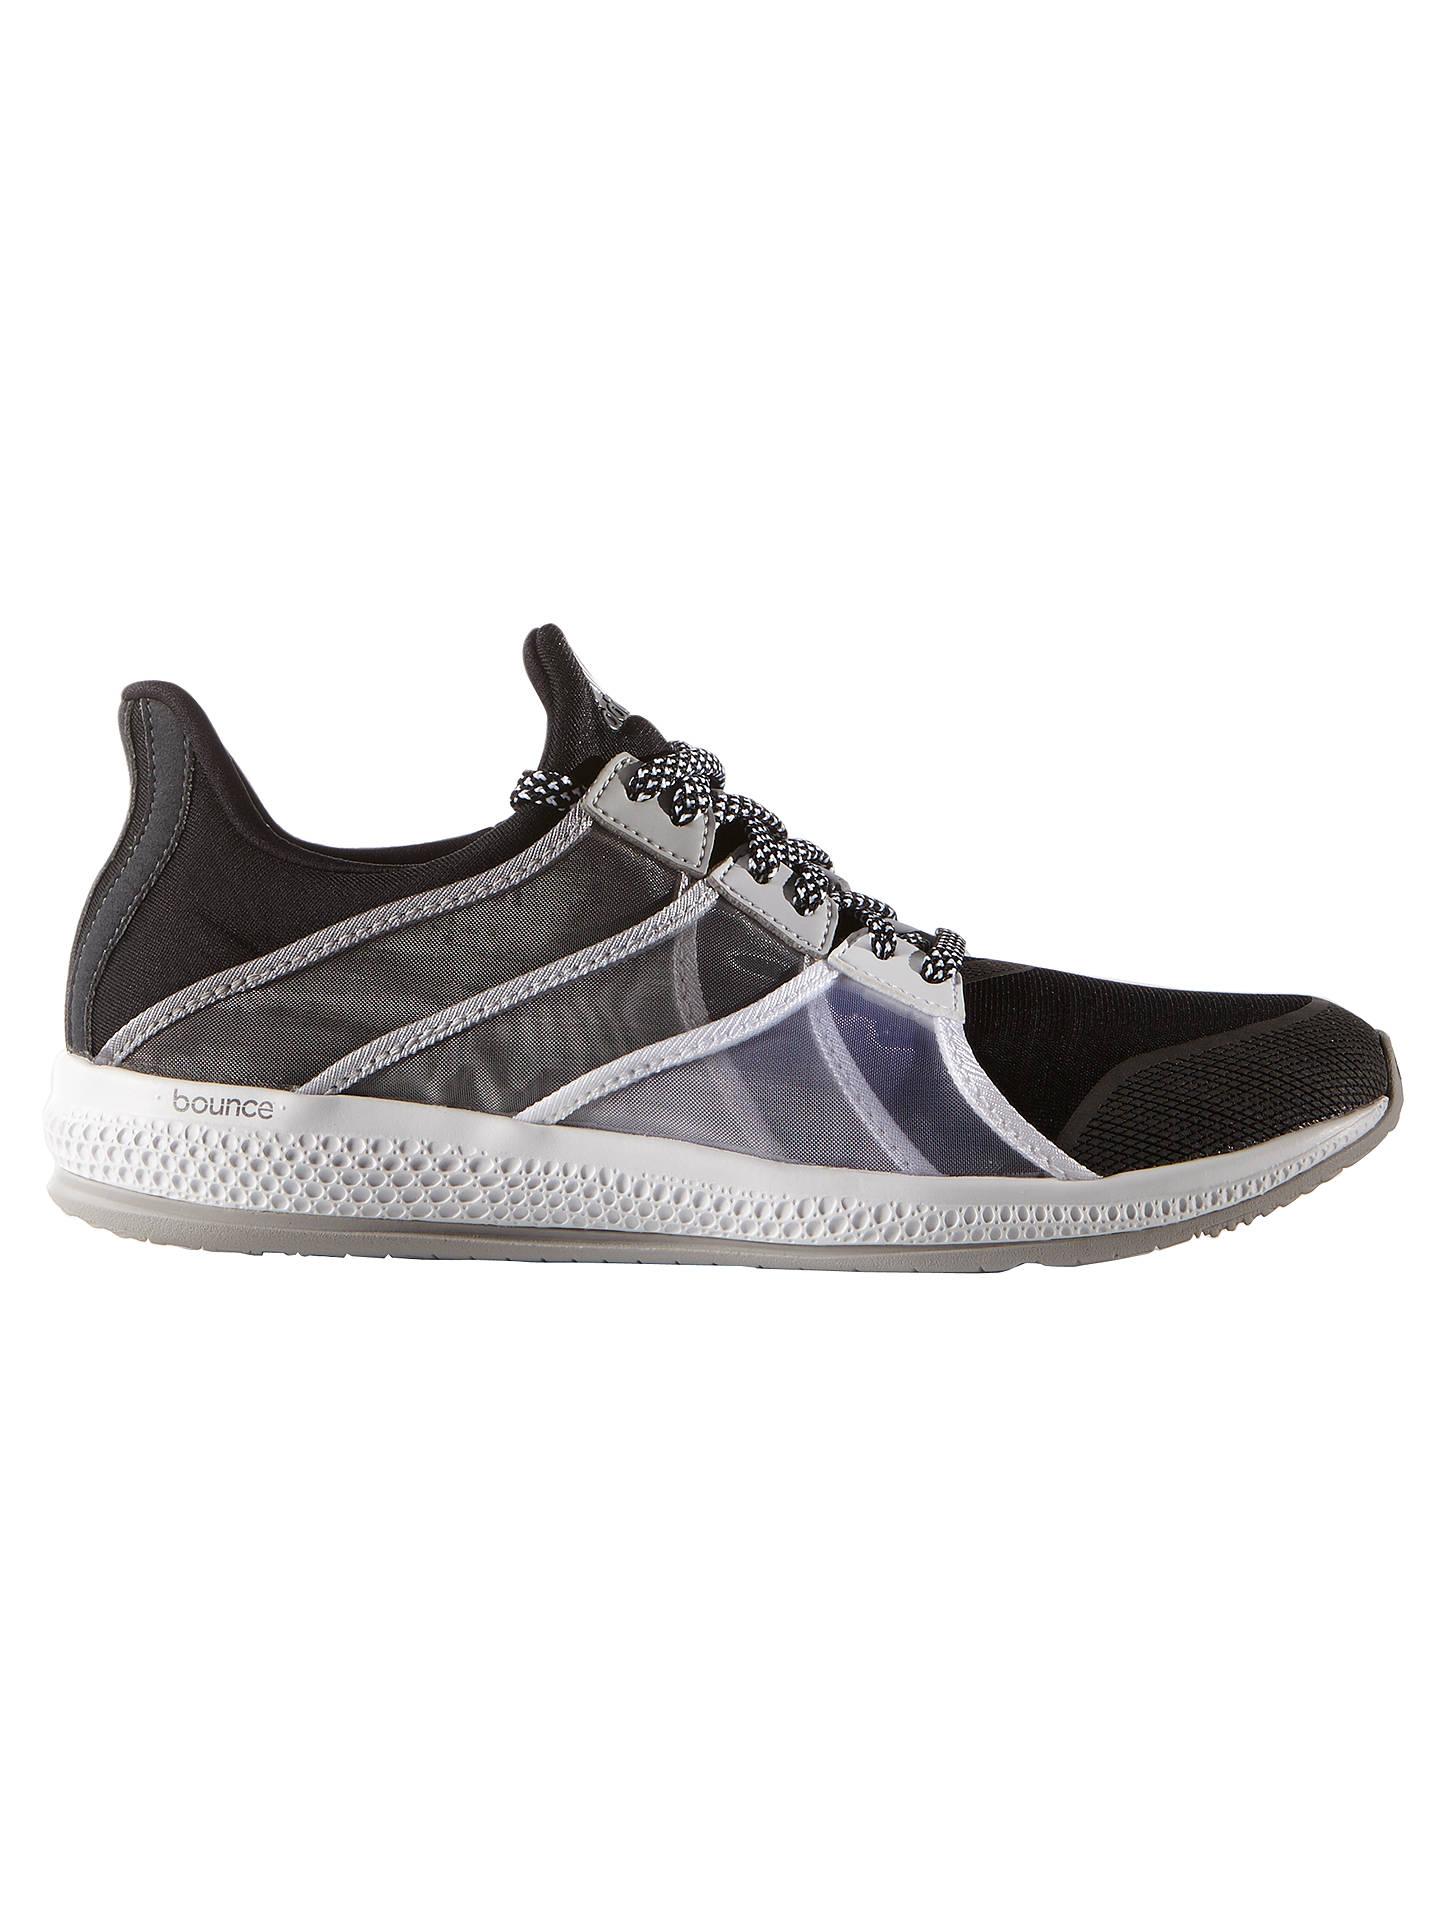 Polar Negligencia caja registradora  Adidas Gymbreaker Bounce Women's Cross Trainers, Black/White at John Lewis  & Partners